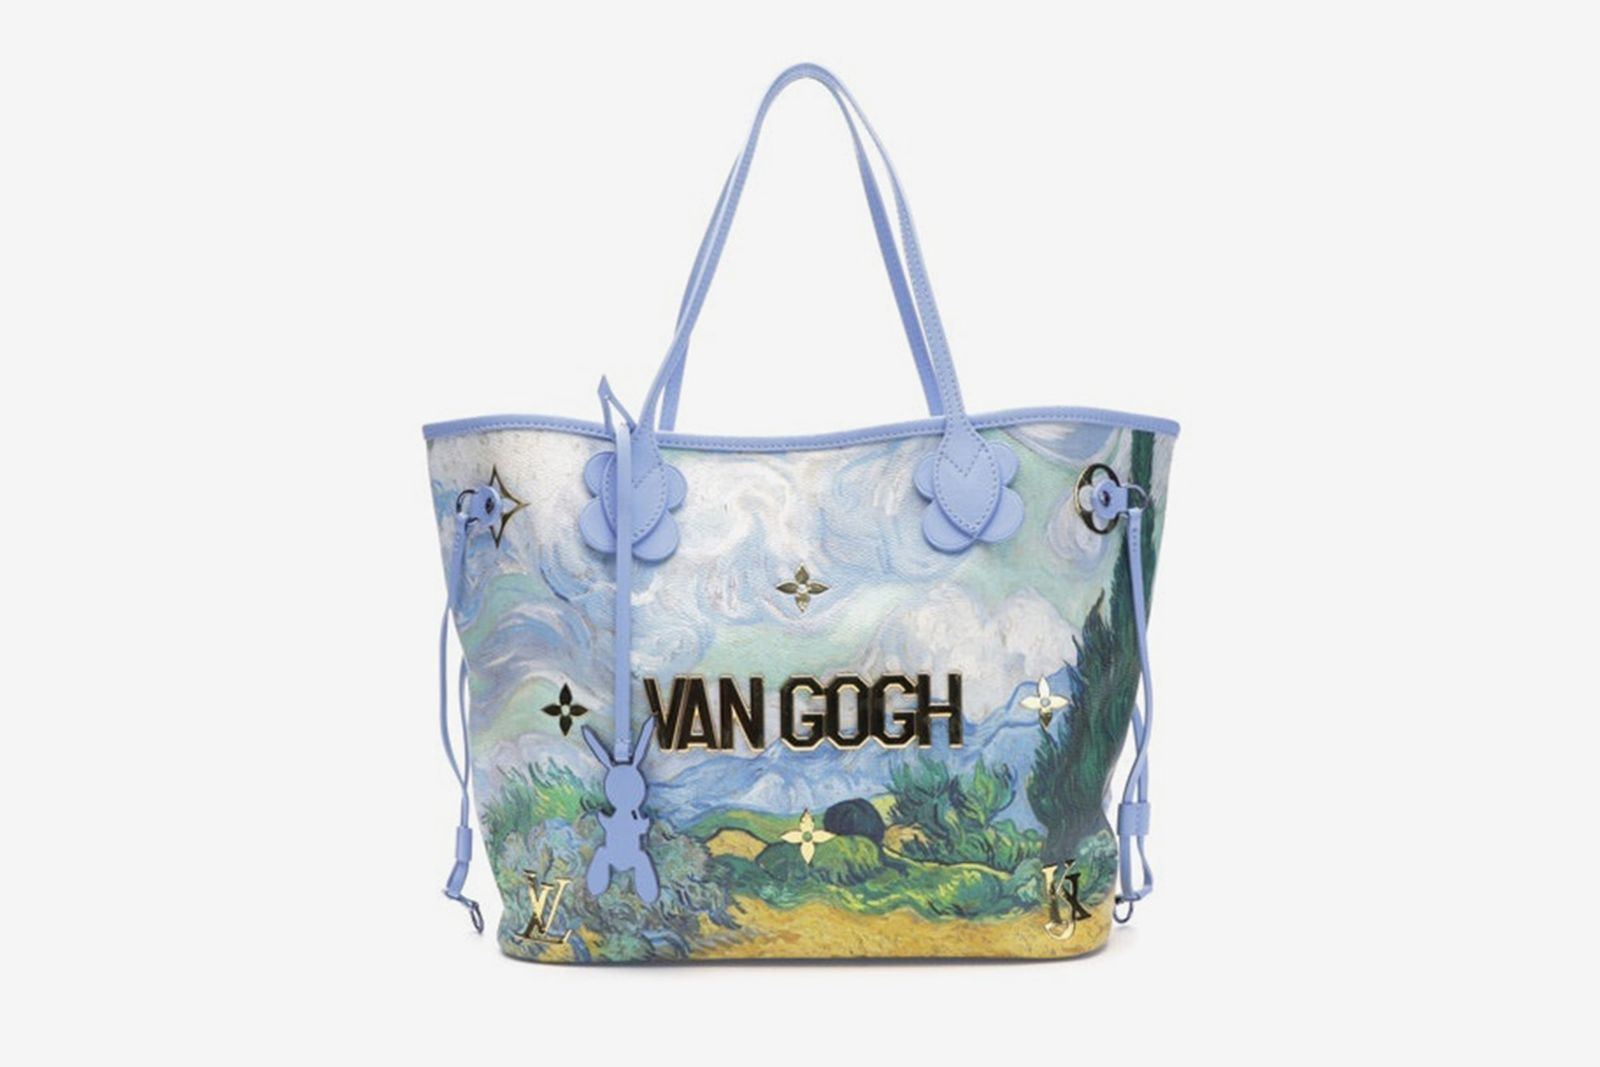 Louis Vuitton x Jeff Koons Neverfull Van Gogh Masters